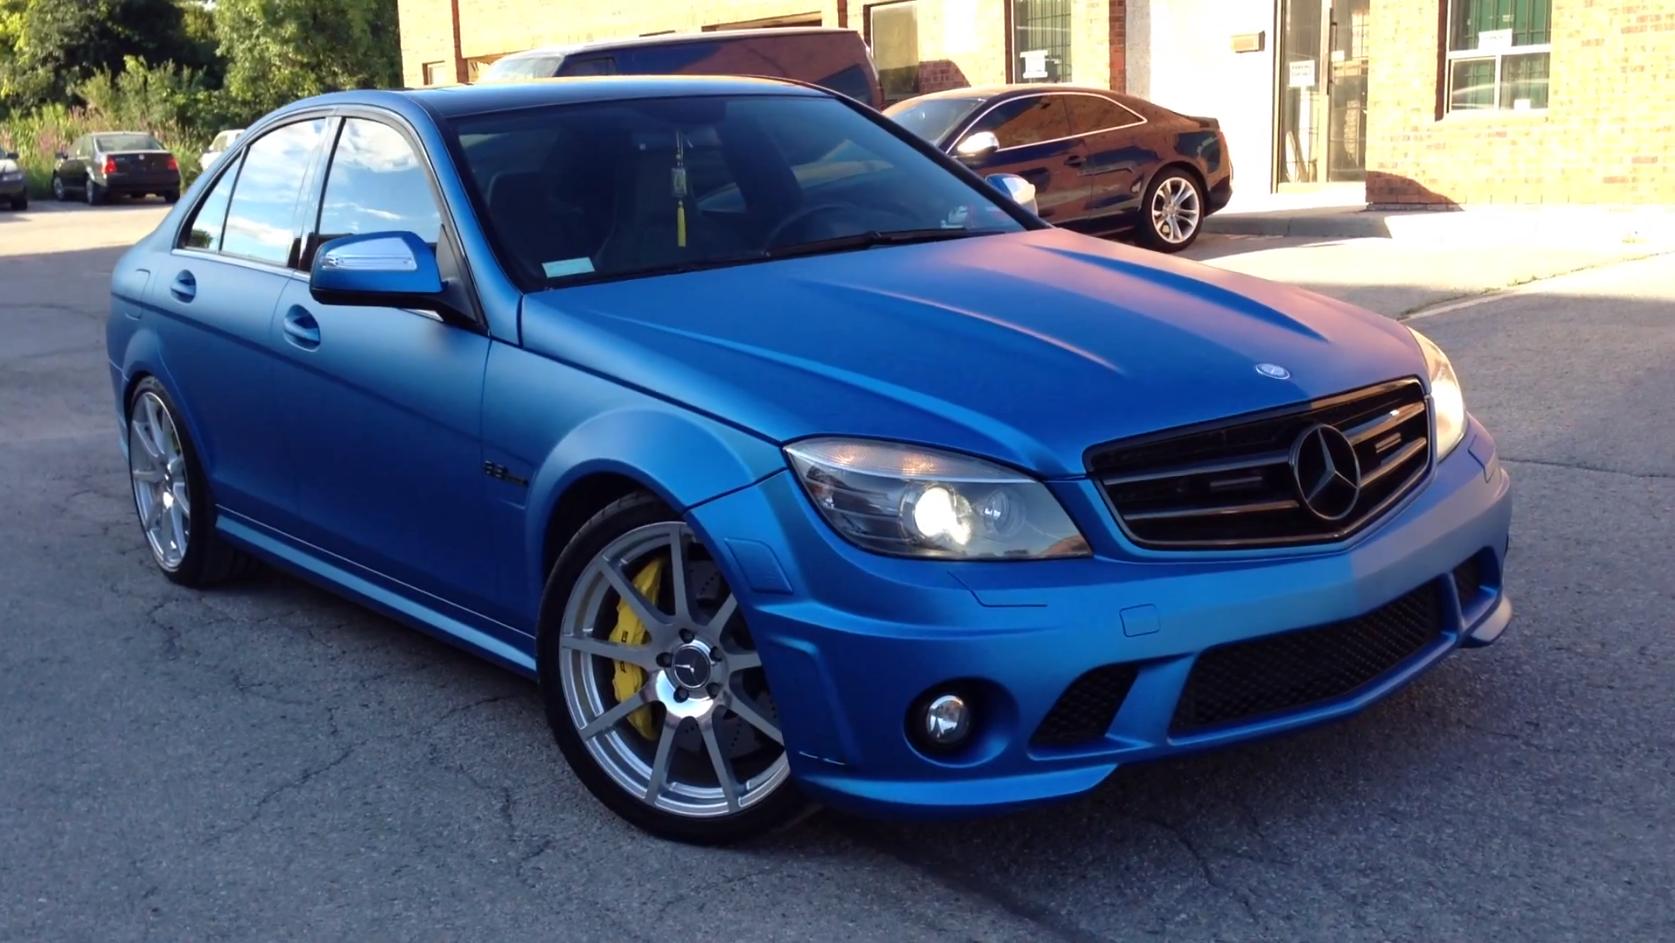 C63 AMG in Matte Metallic Blue Looks Frozen - autoevolution